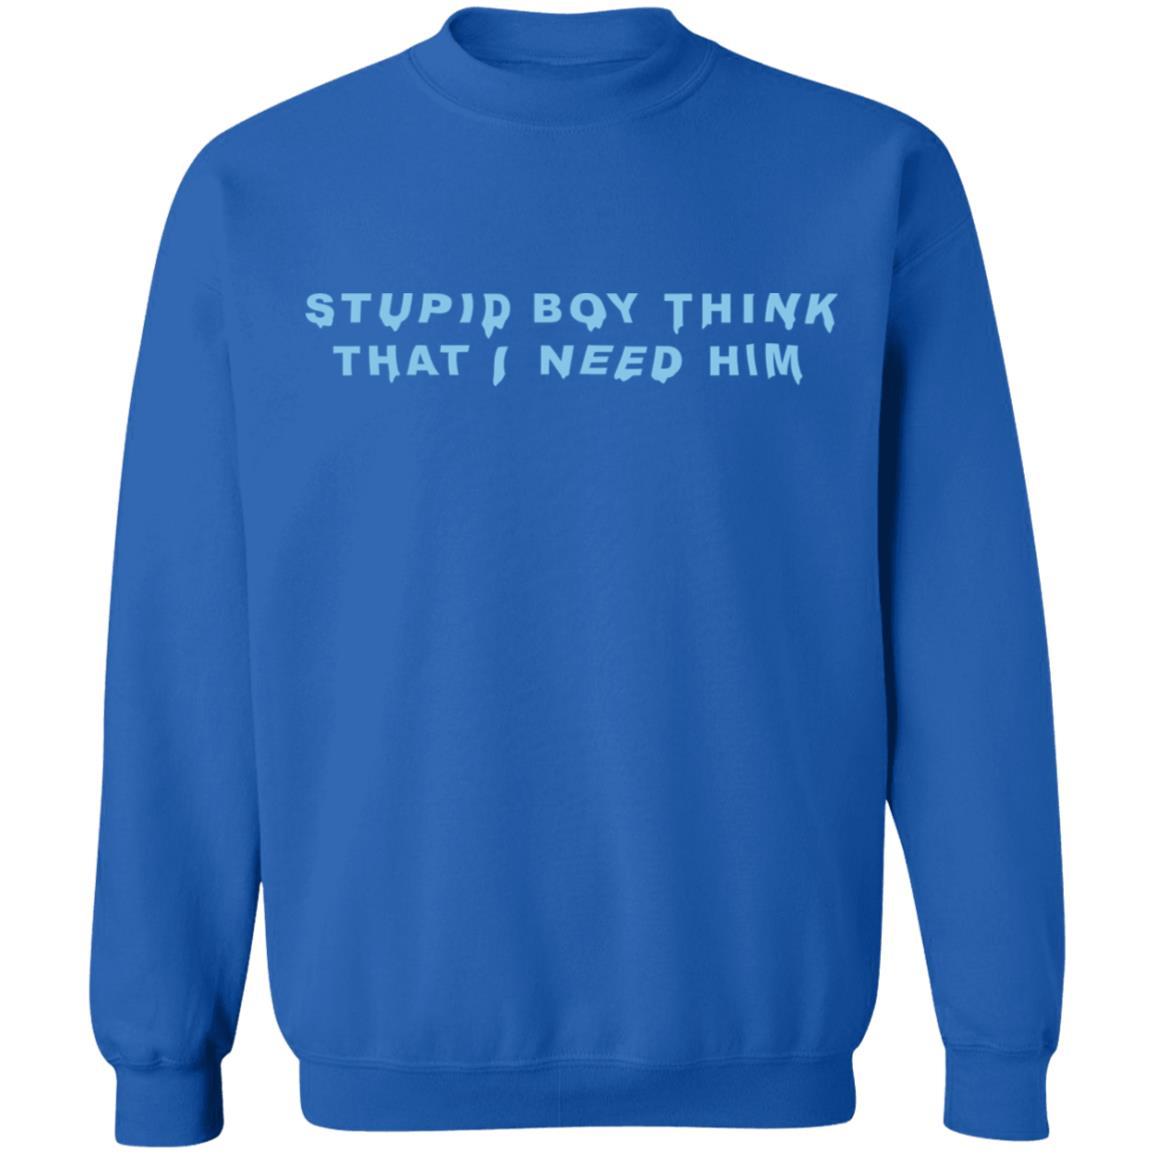 Ashnikko Merch Stupid Boy T Shirt Merchip8 I go red hot like a demon. ashnikko merch stupid boy t shirt